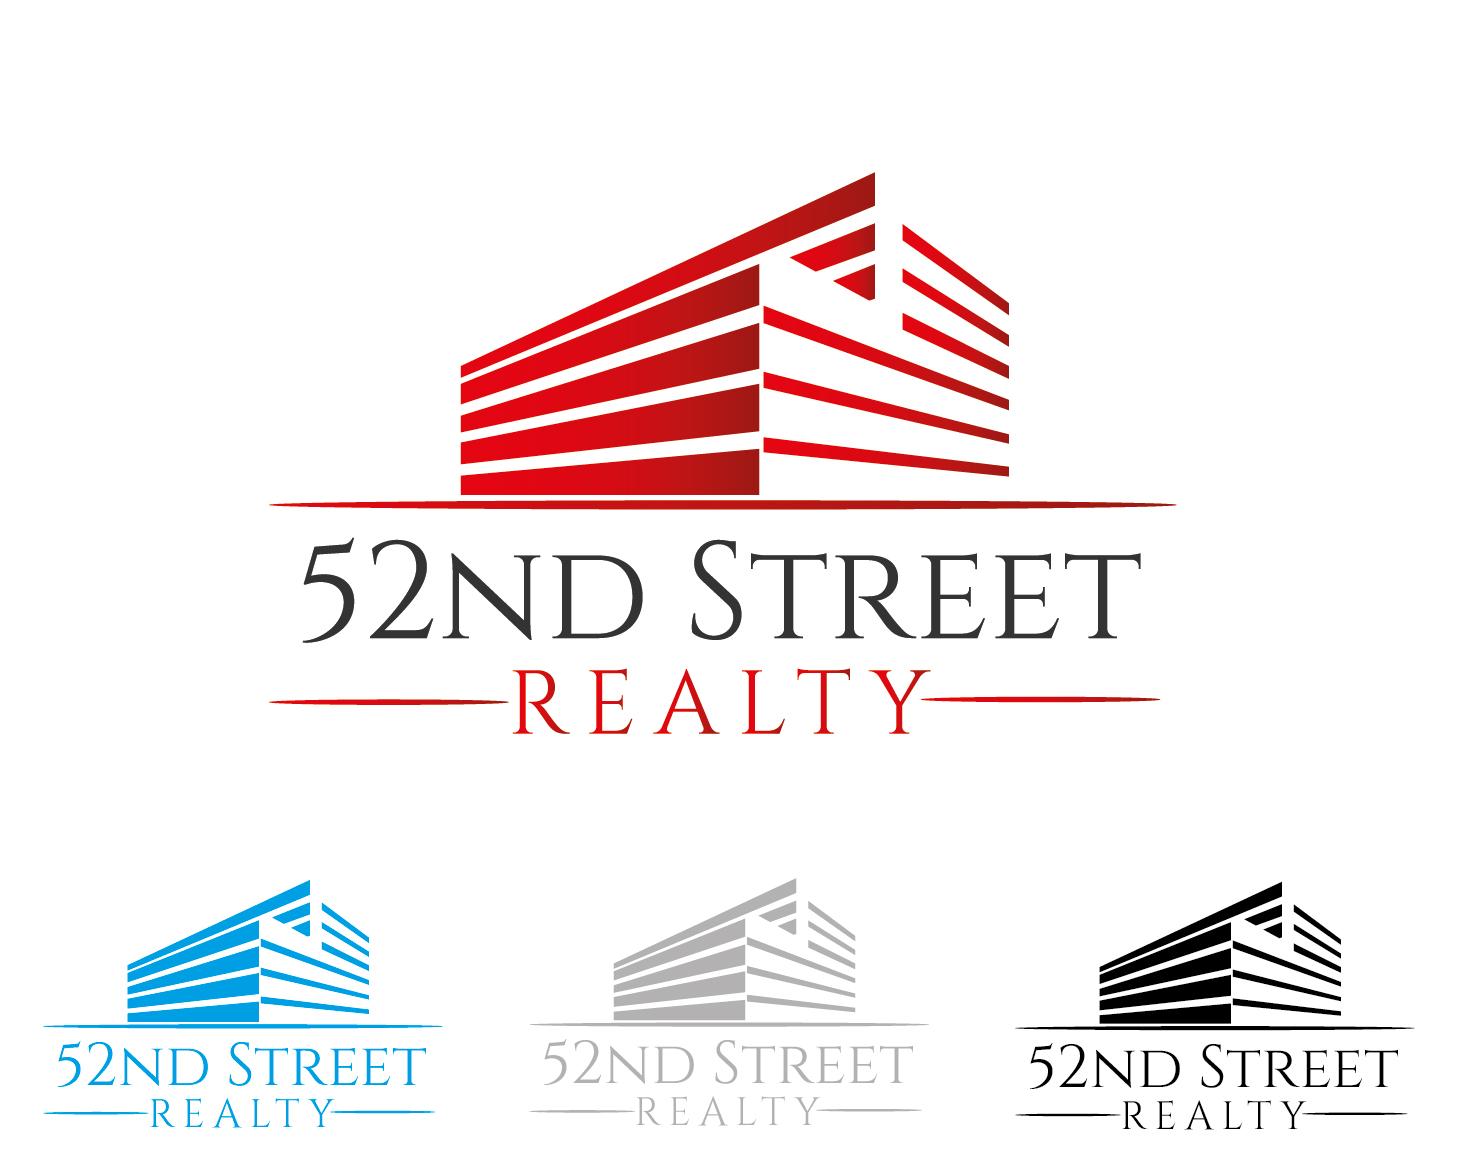 Logo Design by VENTSISLAV KOVACHEV - Entry No. 52 in the Logo Design Contest 52nd Street Realty Logo Design.